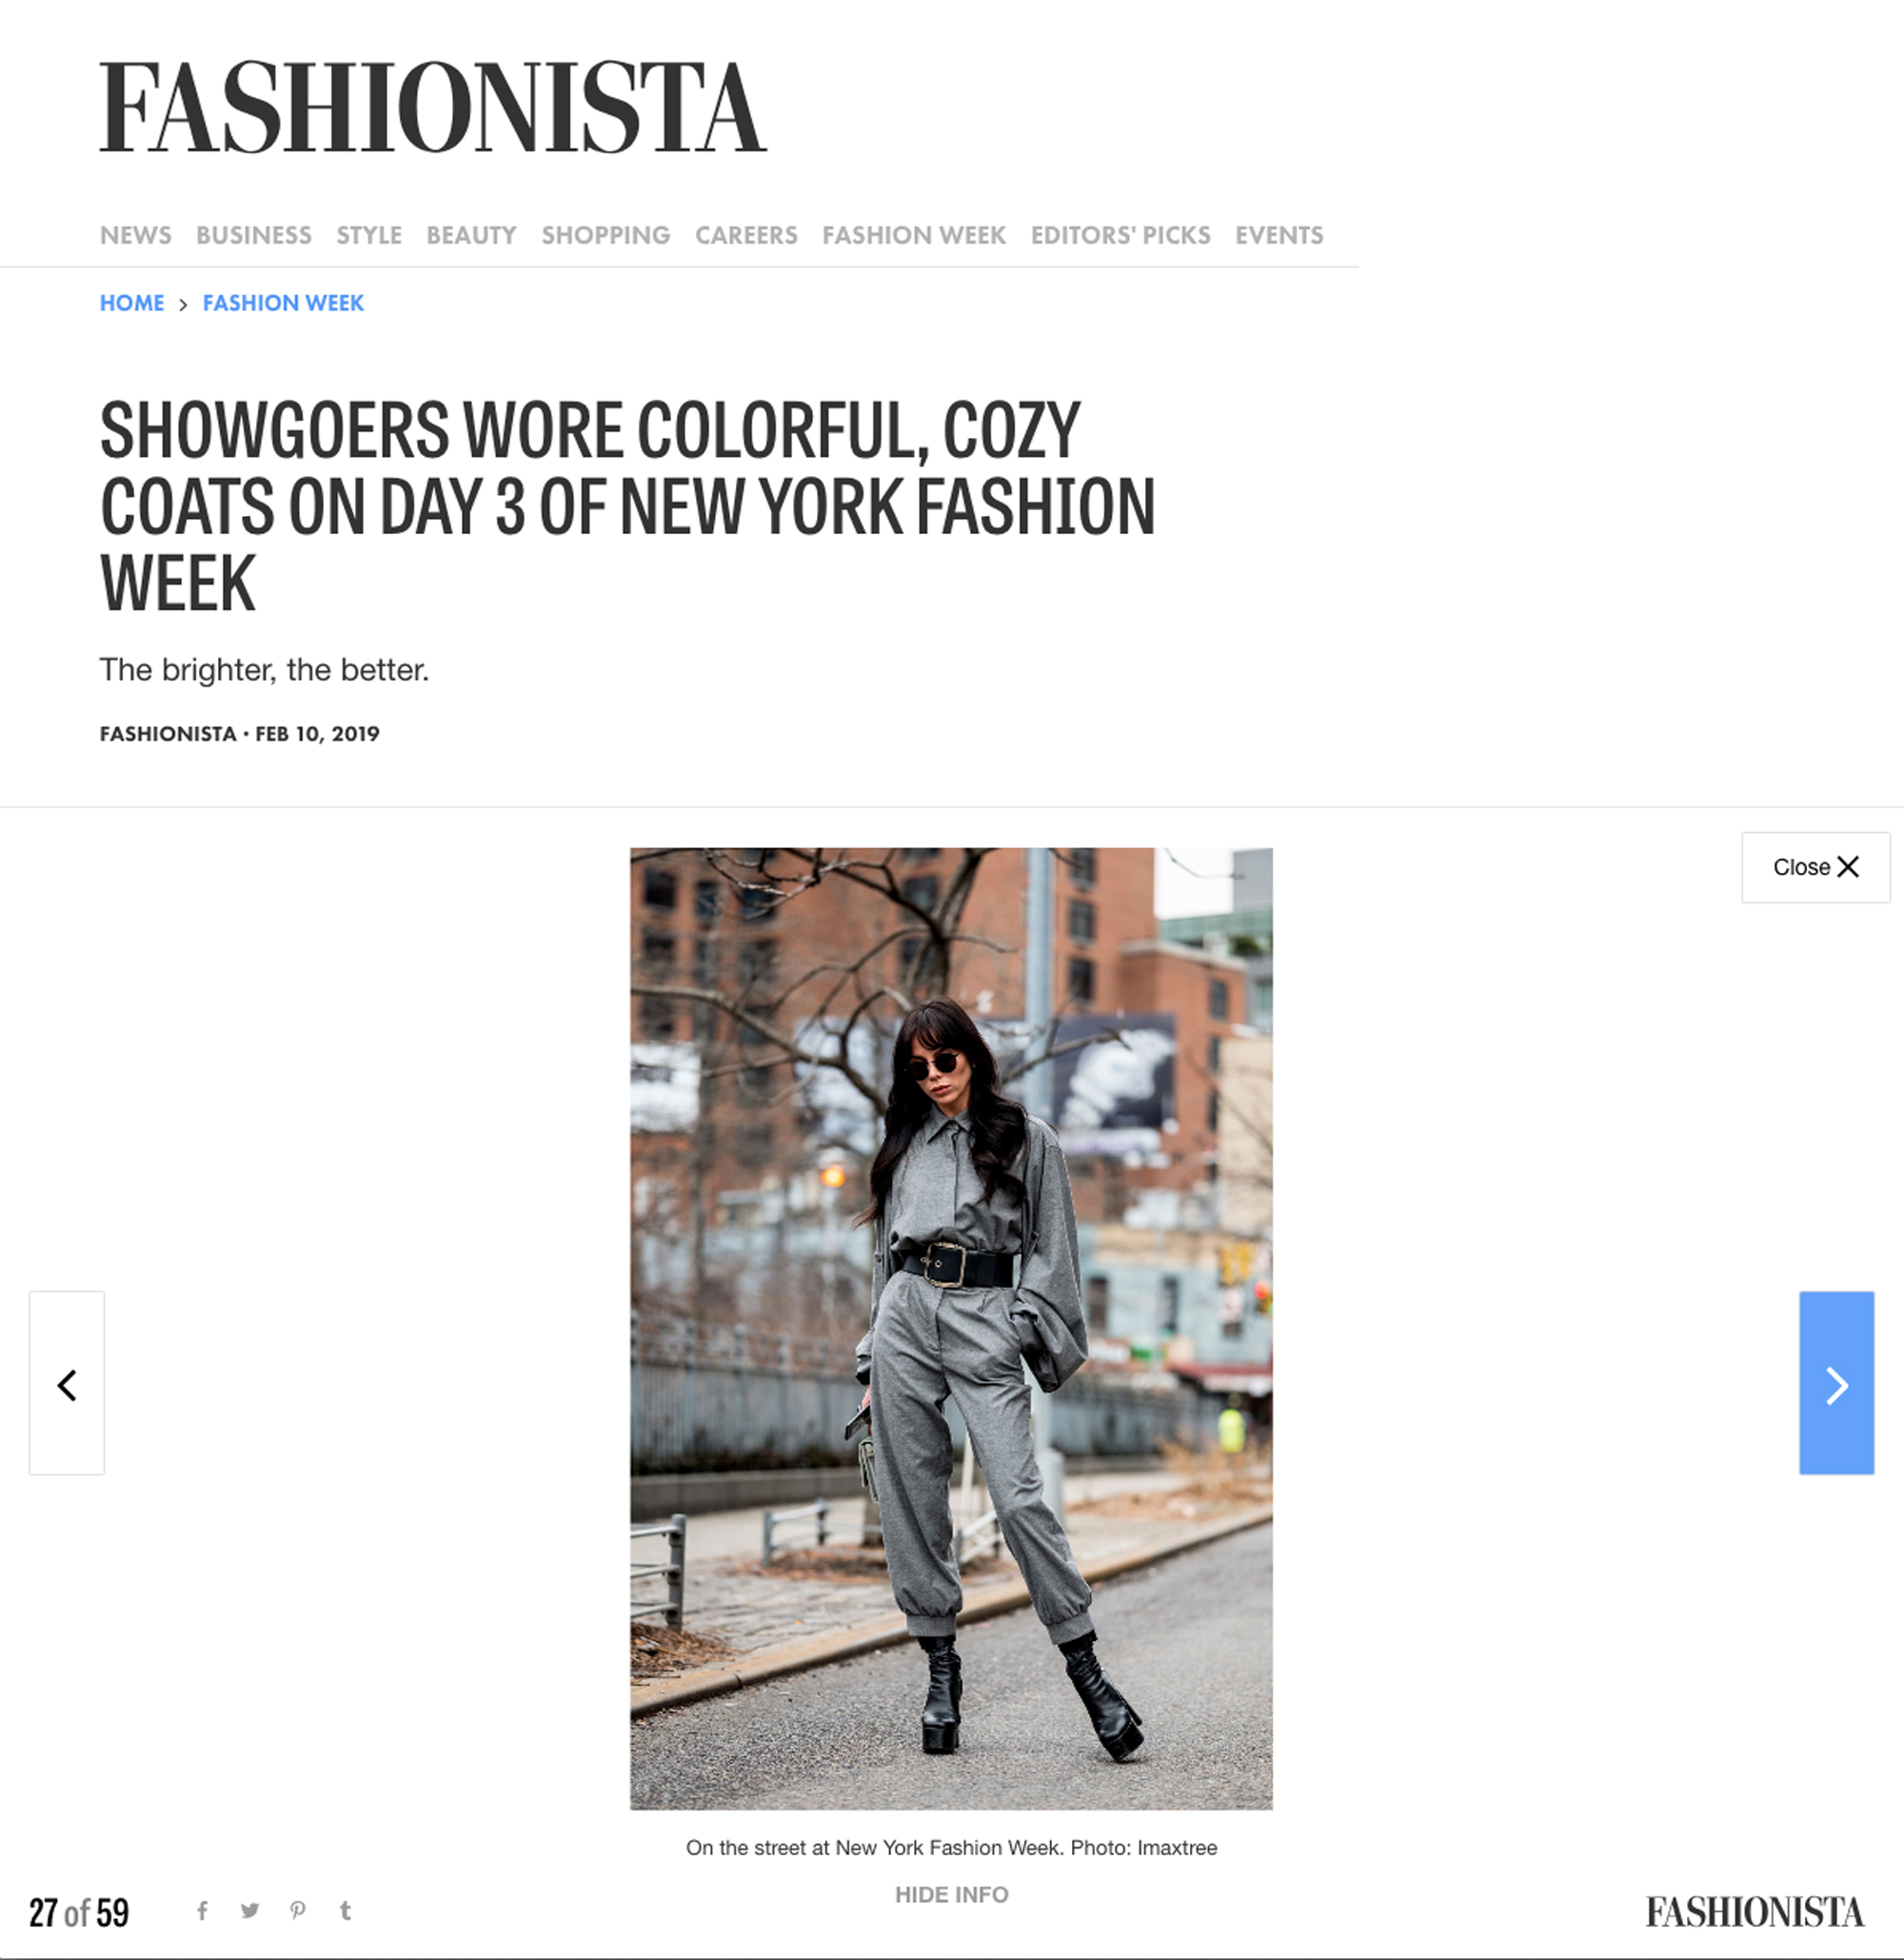 2.10.19 Fashionista.com Kalmanovich.jpg